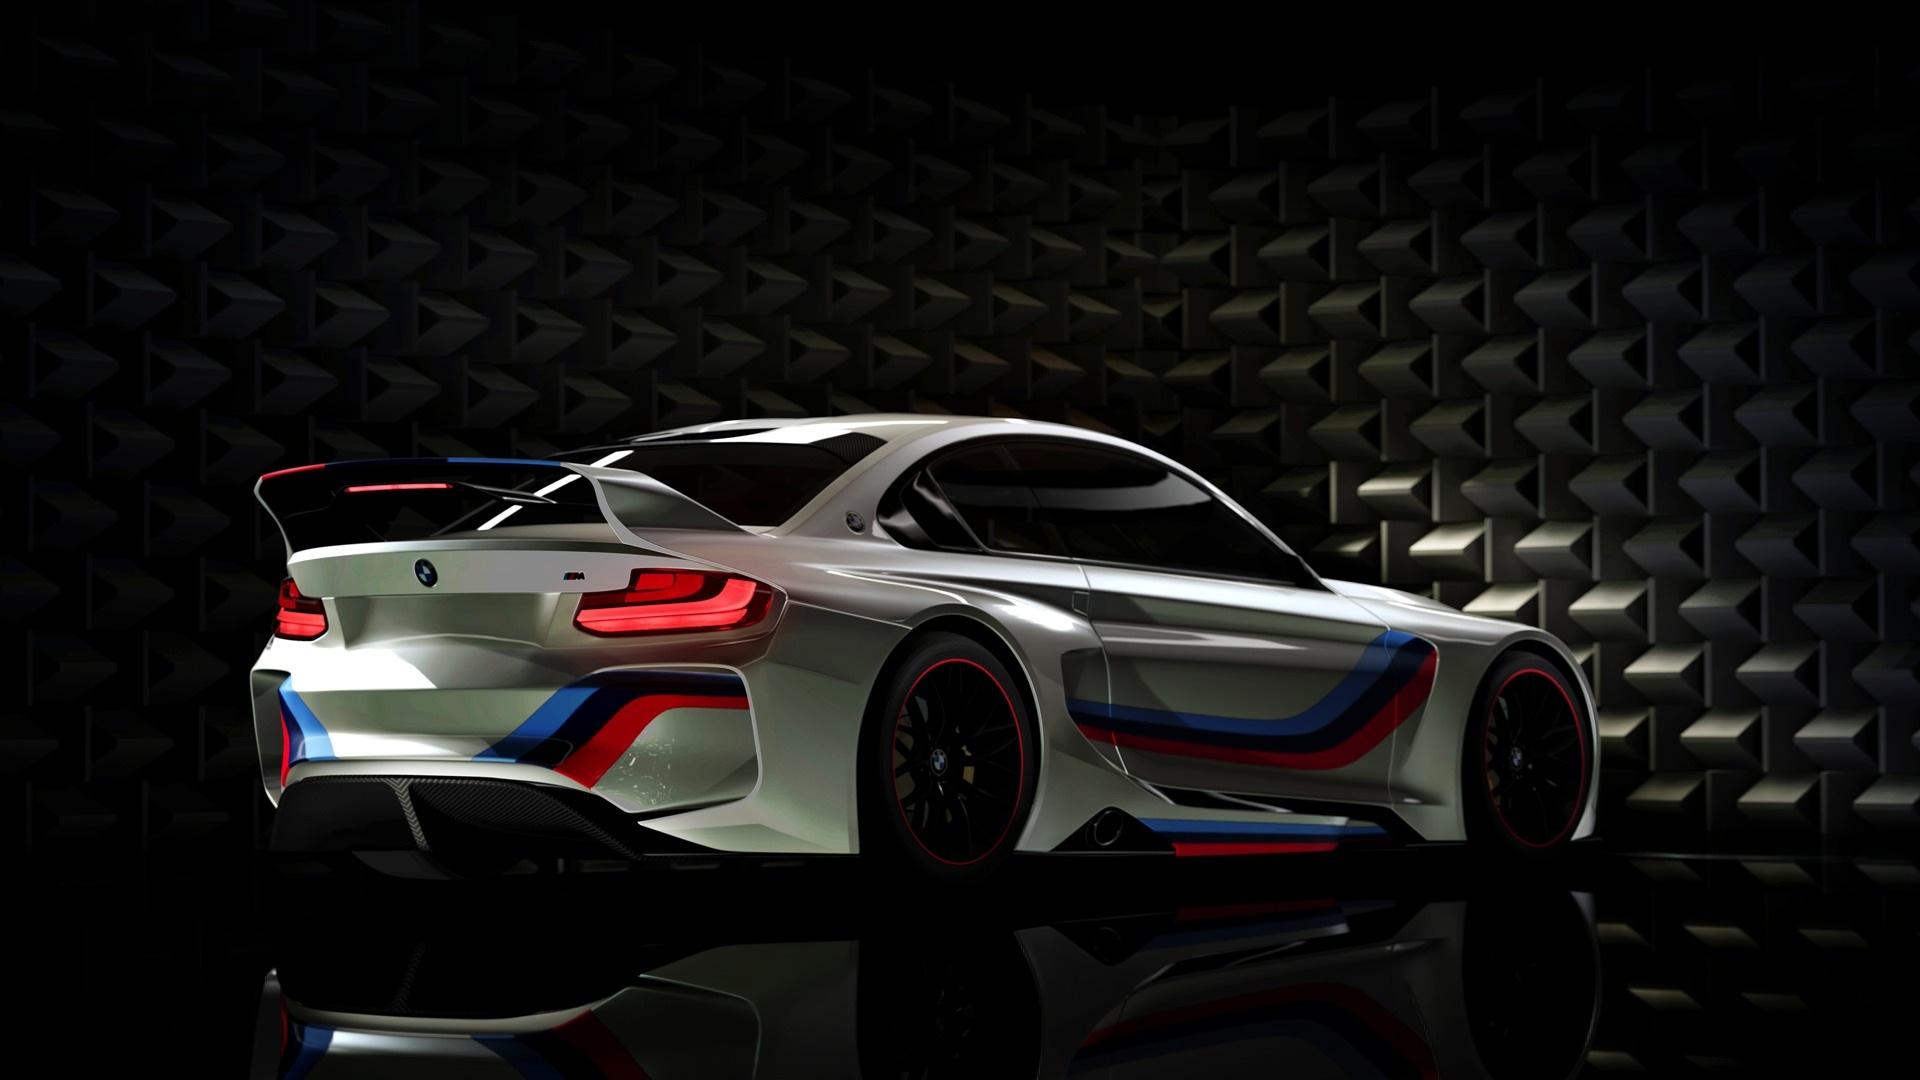 Bmw Unveils Vision Gran Turismo Concept For Virtual Race Tracks Autoevolution